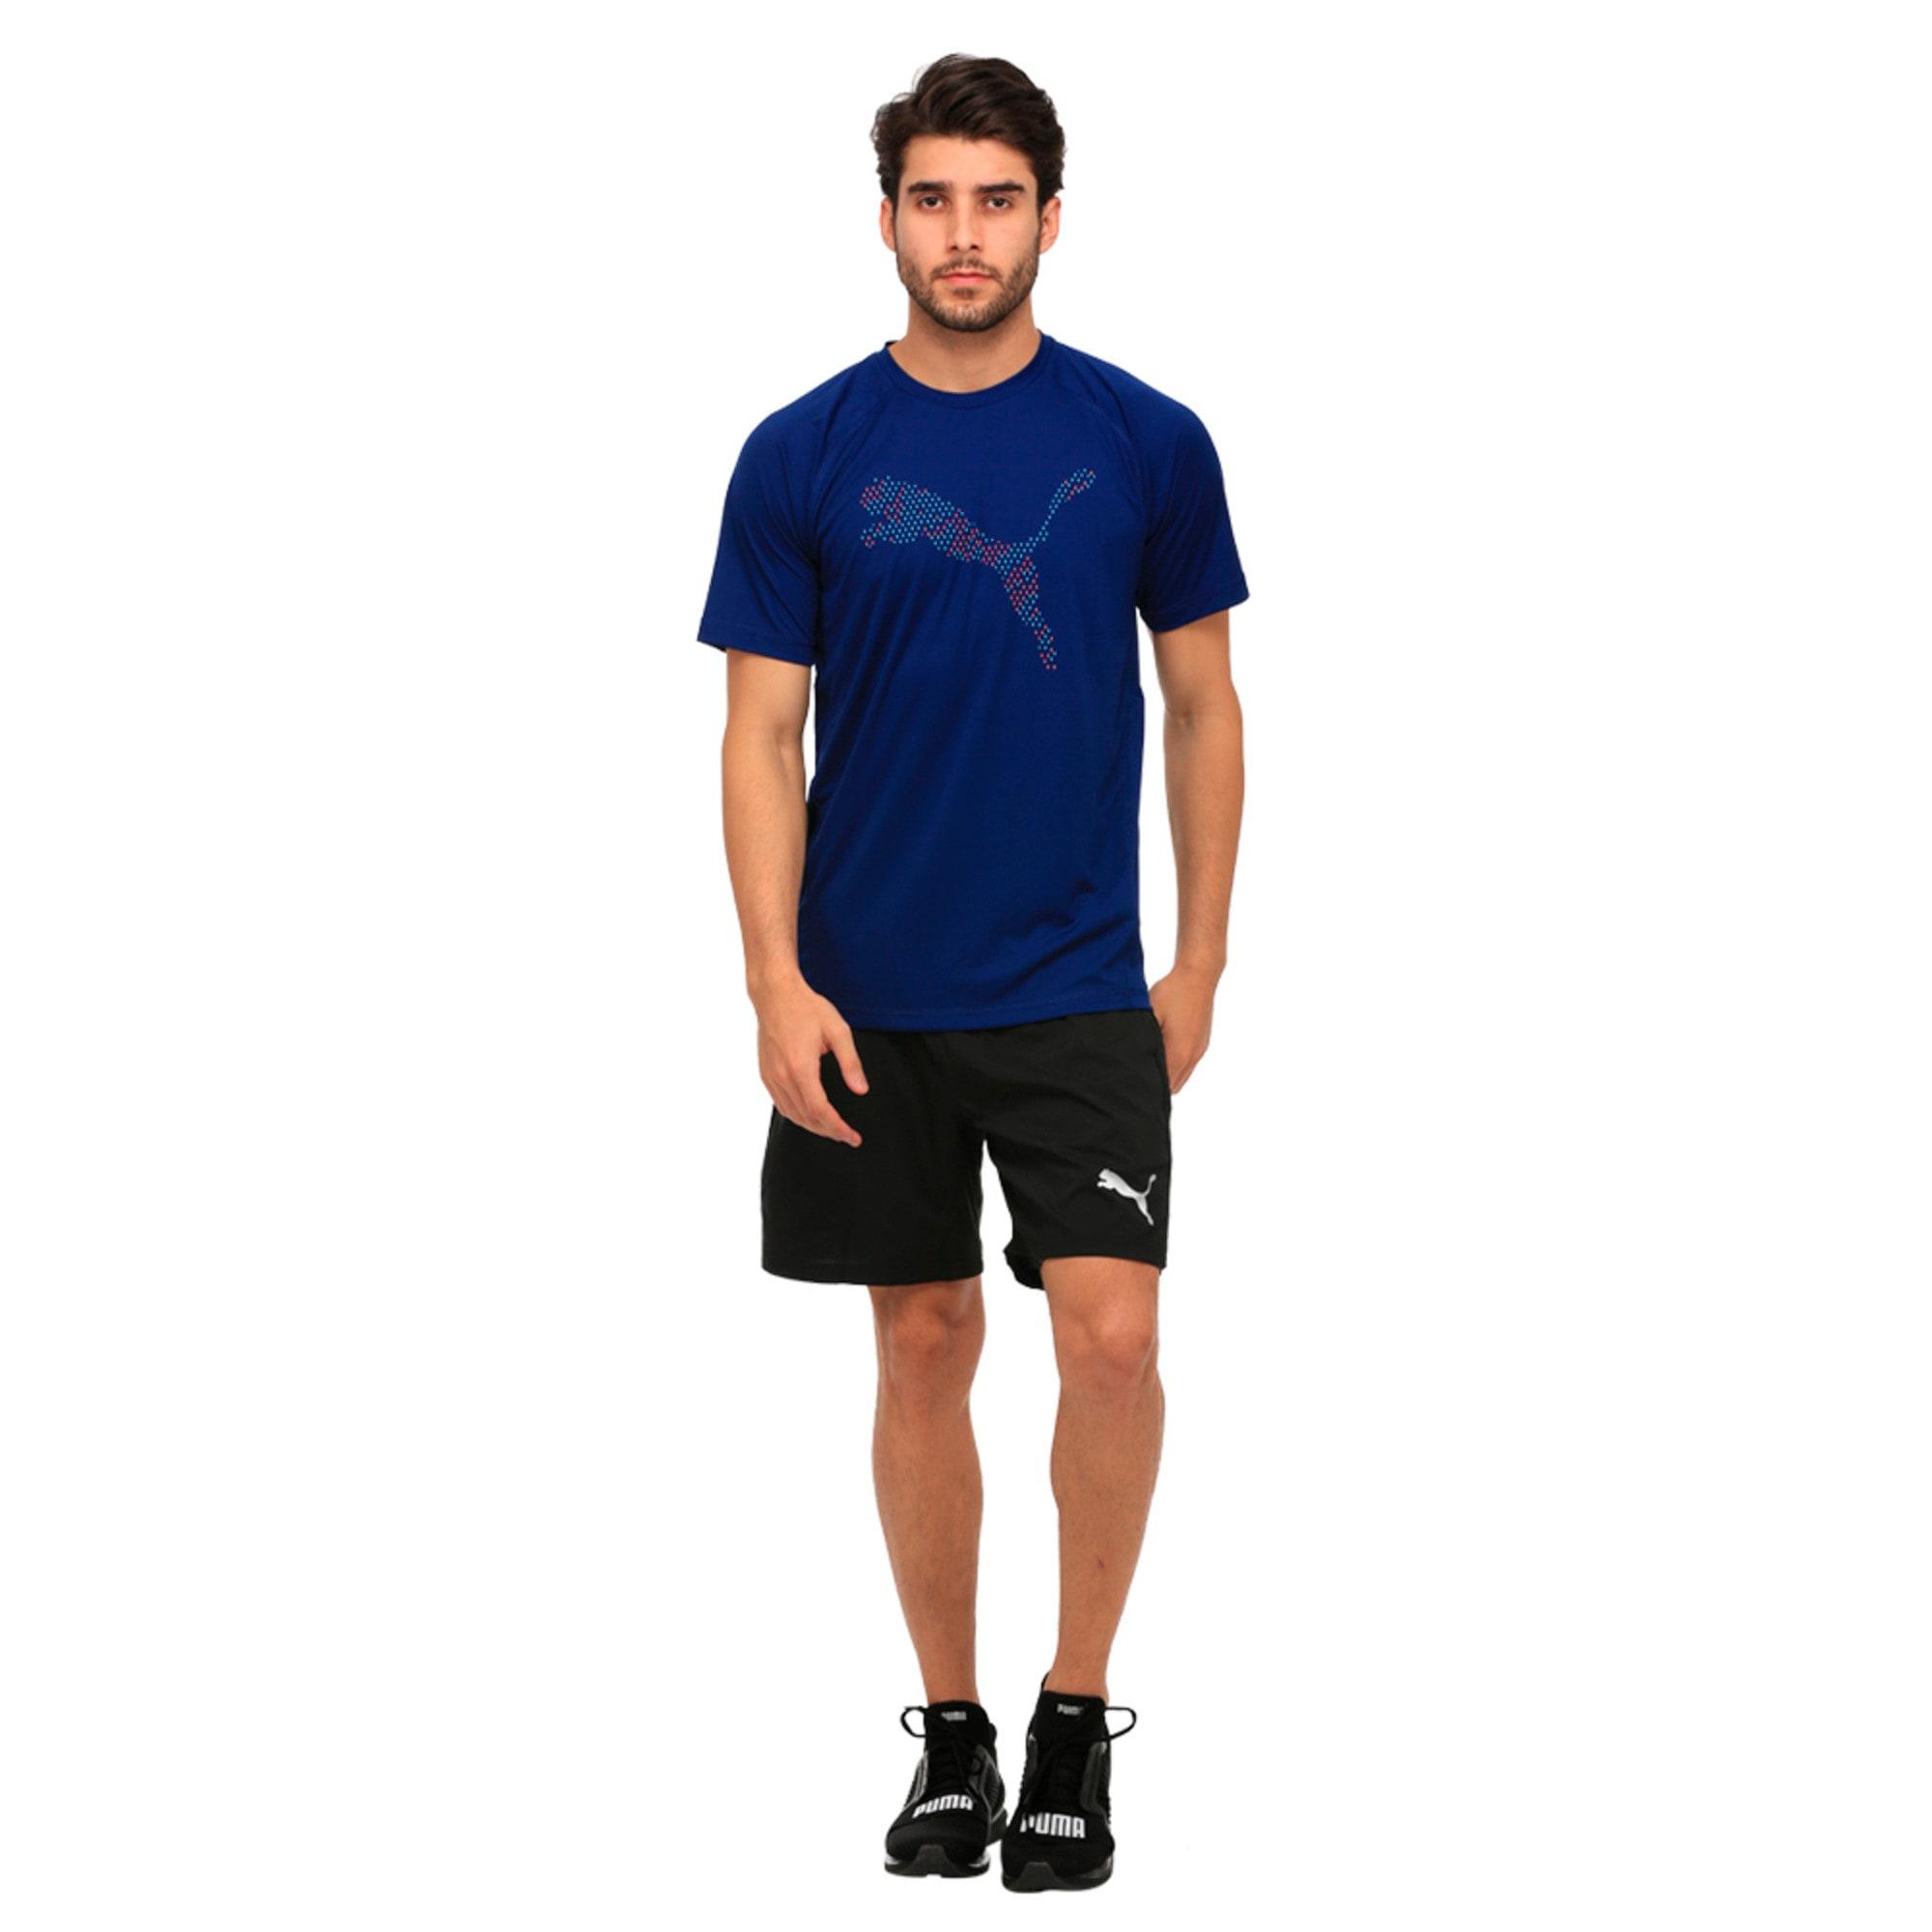 Thumbnail 3 of Active Training Men's 2 in 1 Shorts, Puma Black, medium-IND